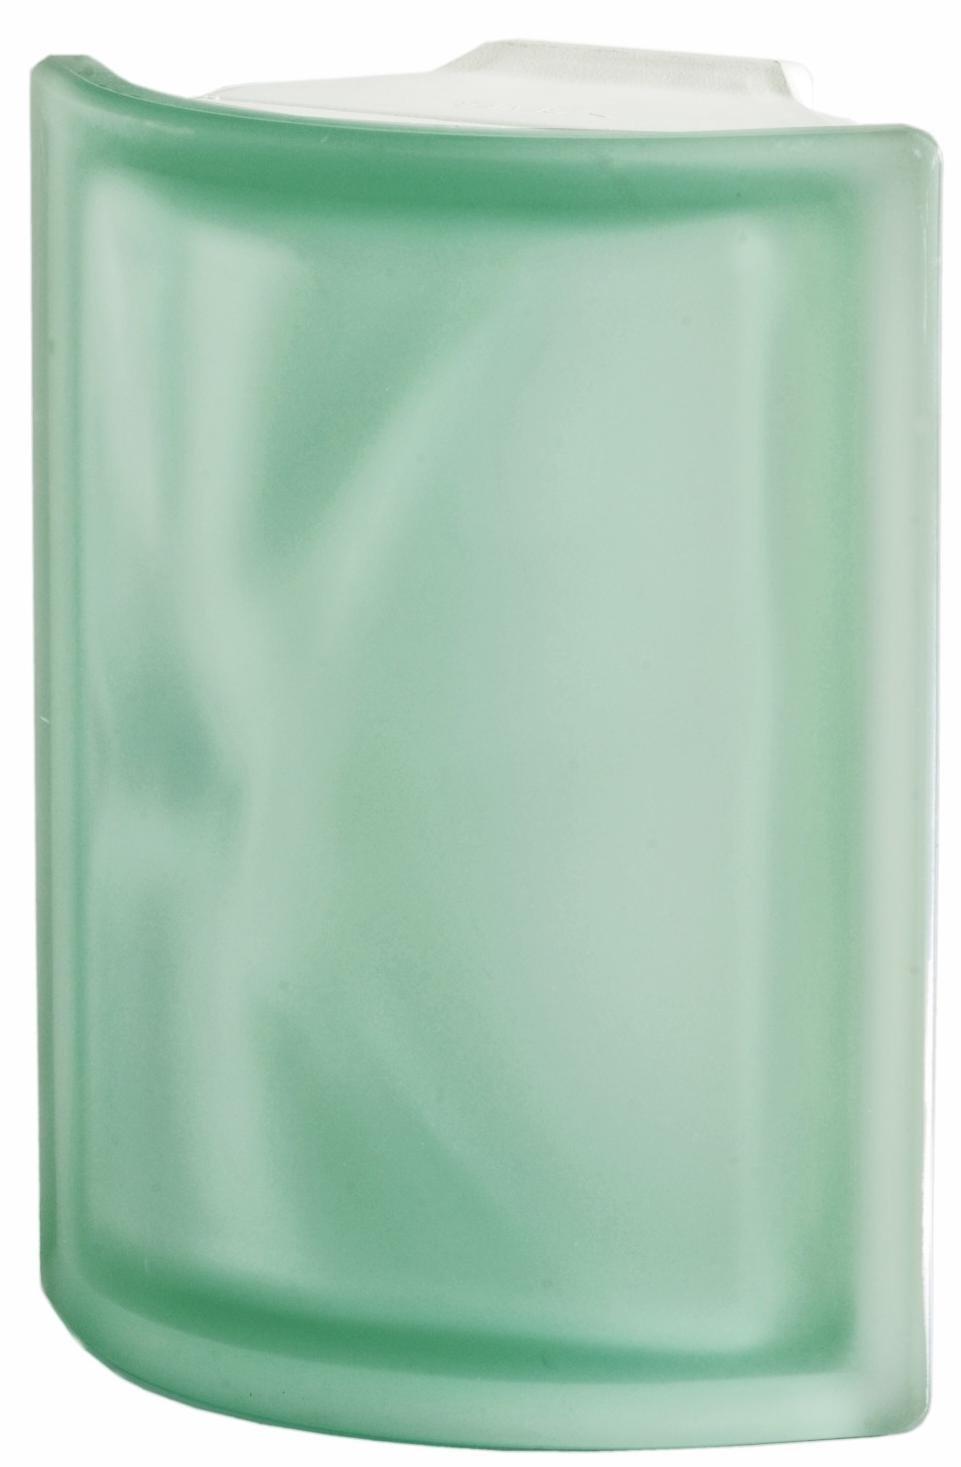 Luxfera Pegasus Angolare O Verde, svlnkou, rohová 0